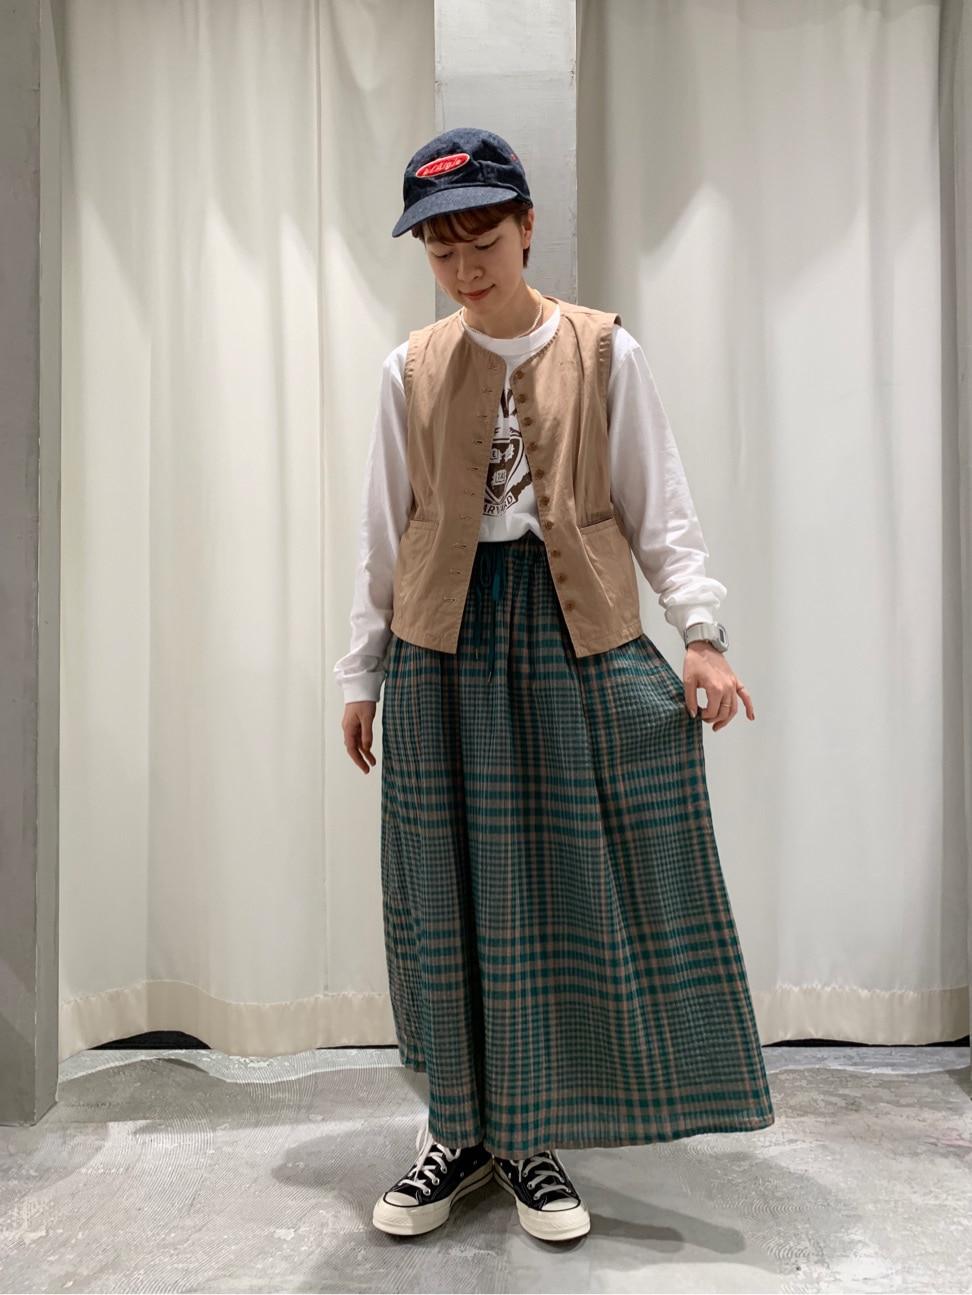 - CHILD WOMAN CHILD WOMAN , PAR ICI ルミネ横浜 身長:158cm 2020.09.02